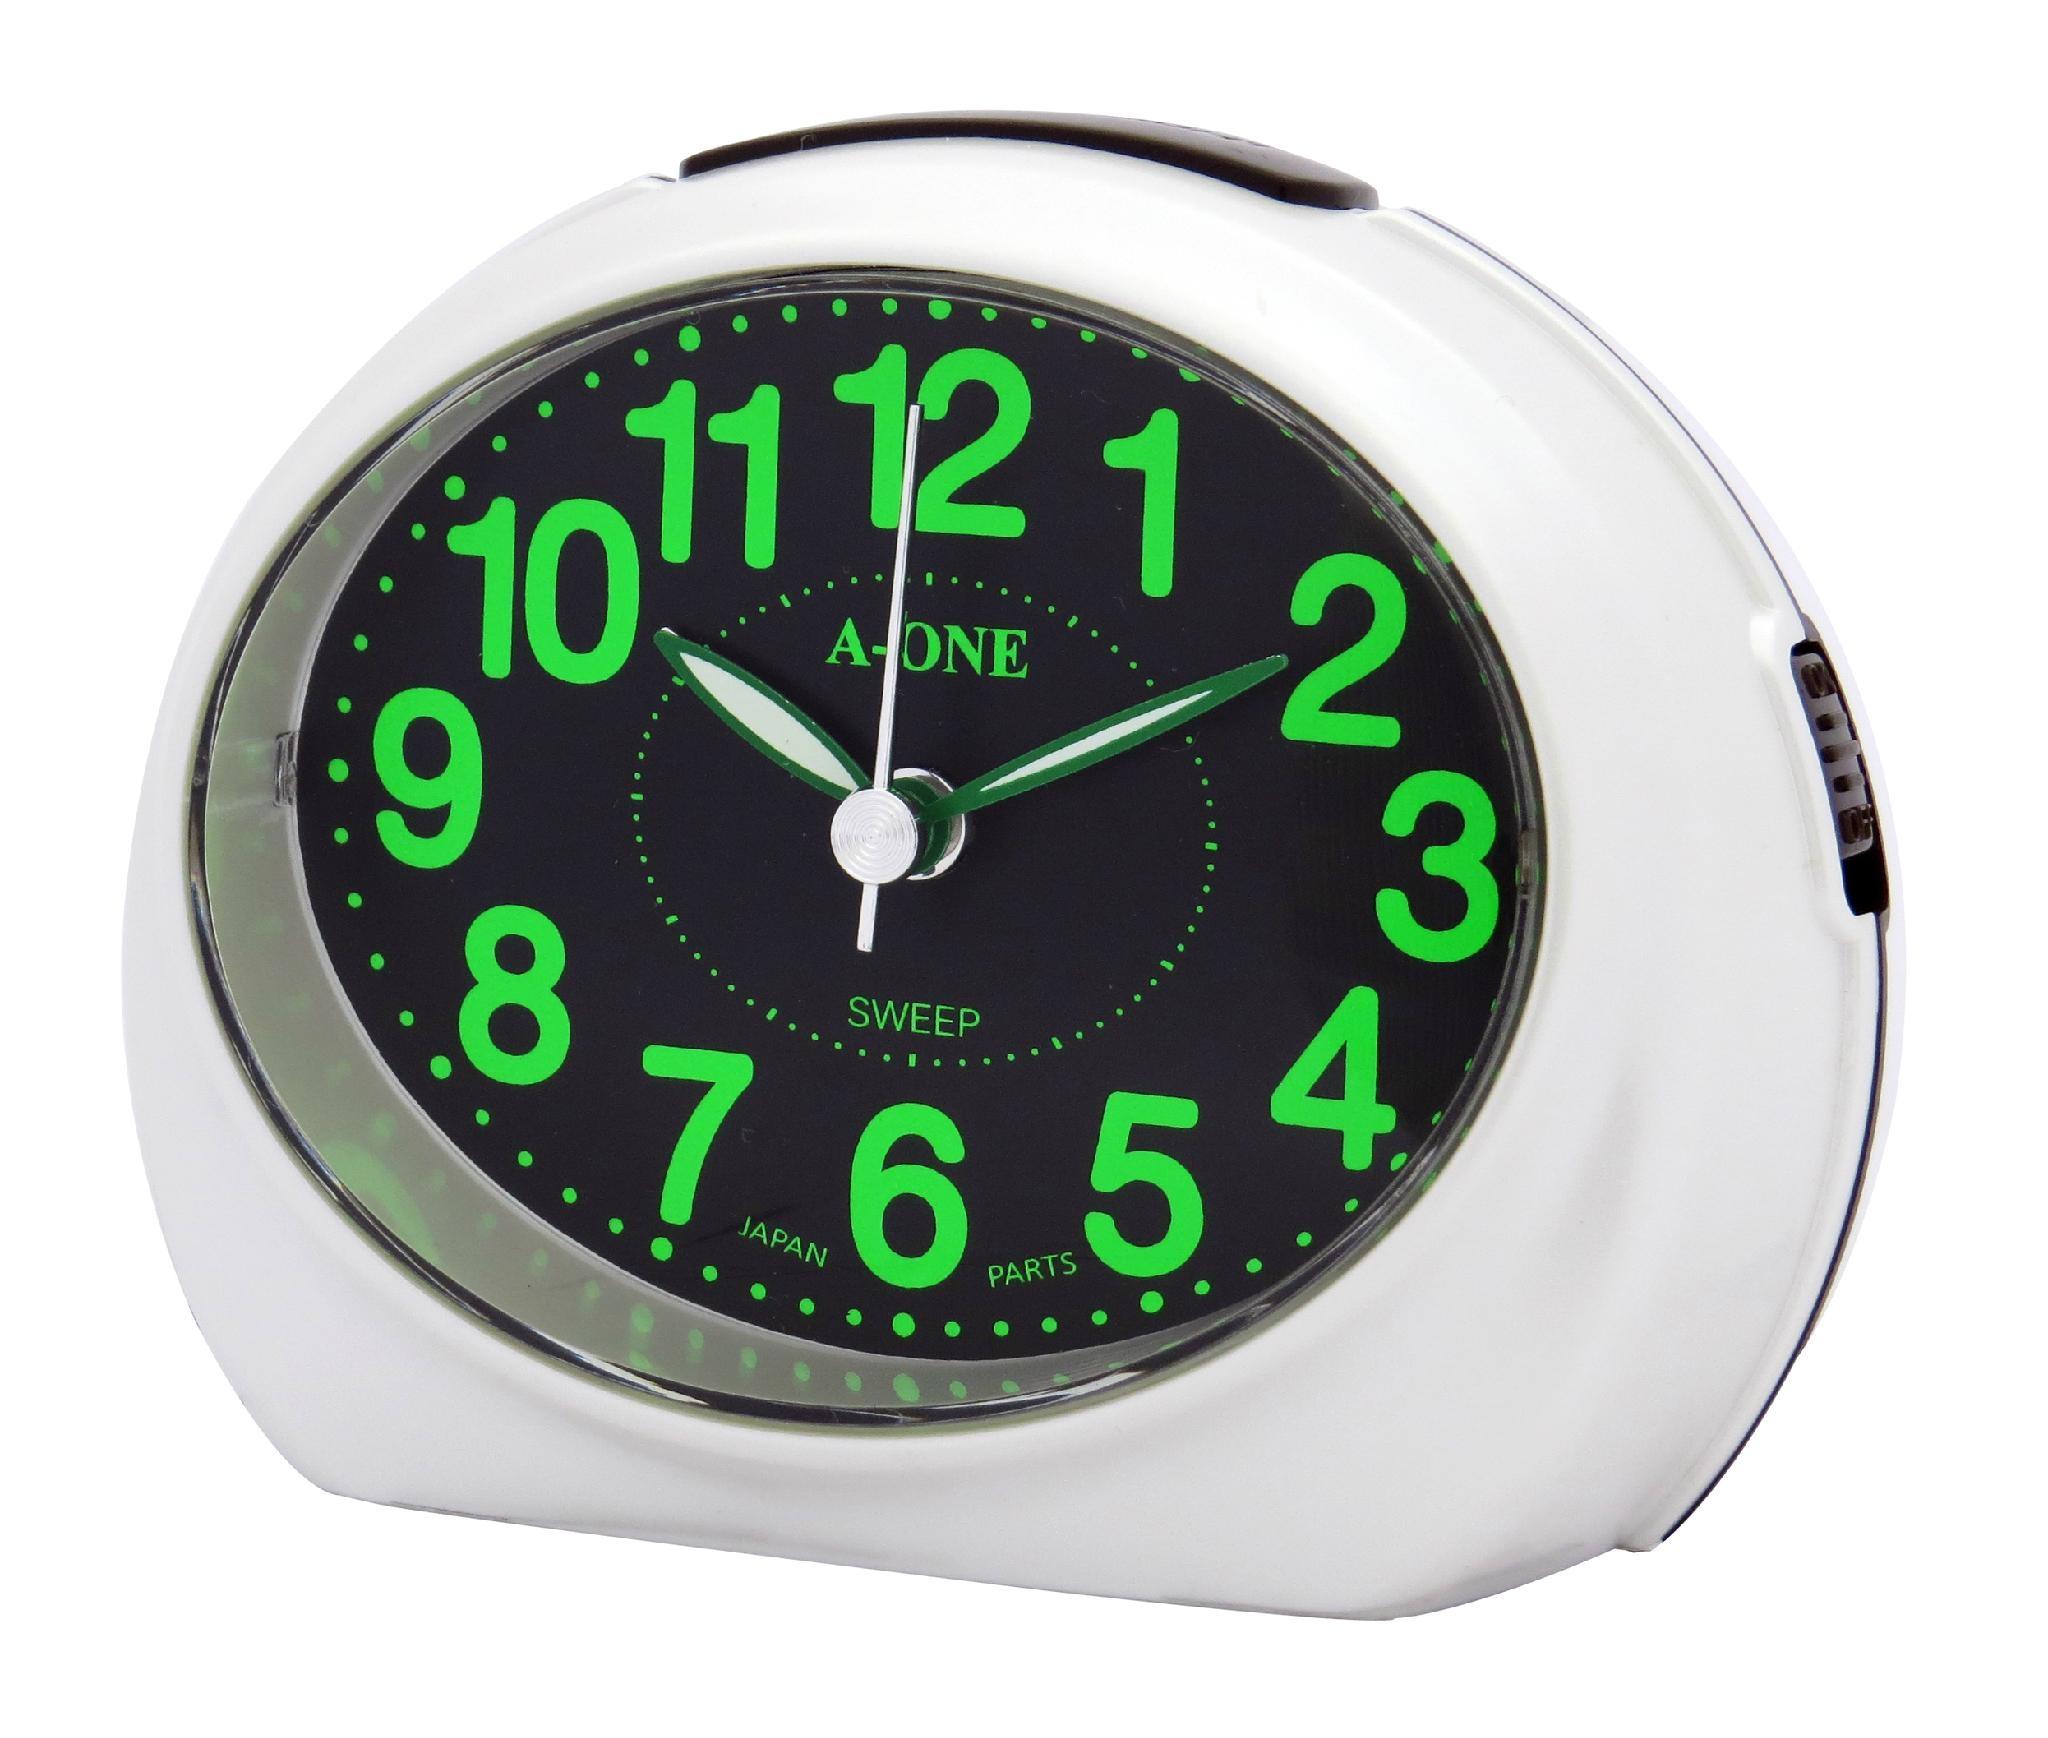 TG-0162 彩豔螢光數字Bibi鬧鐘 1